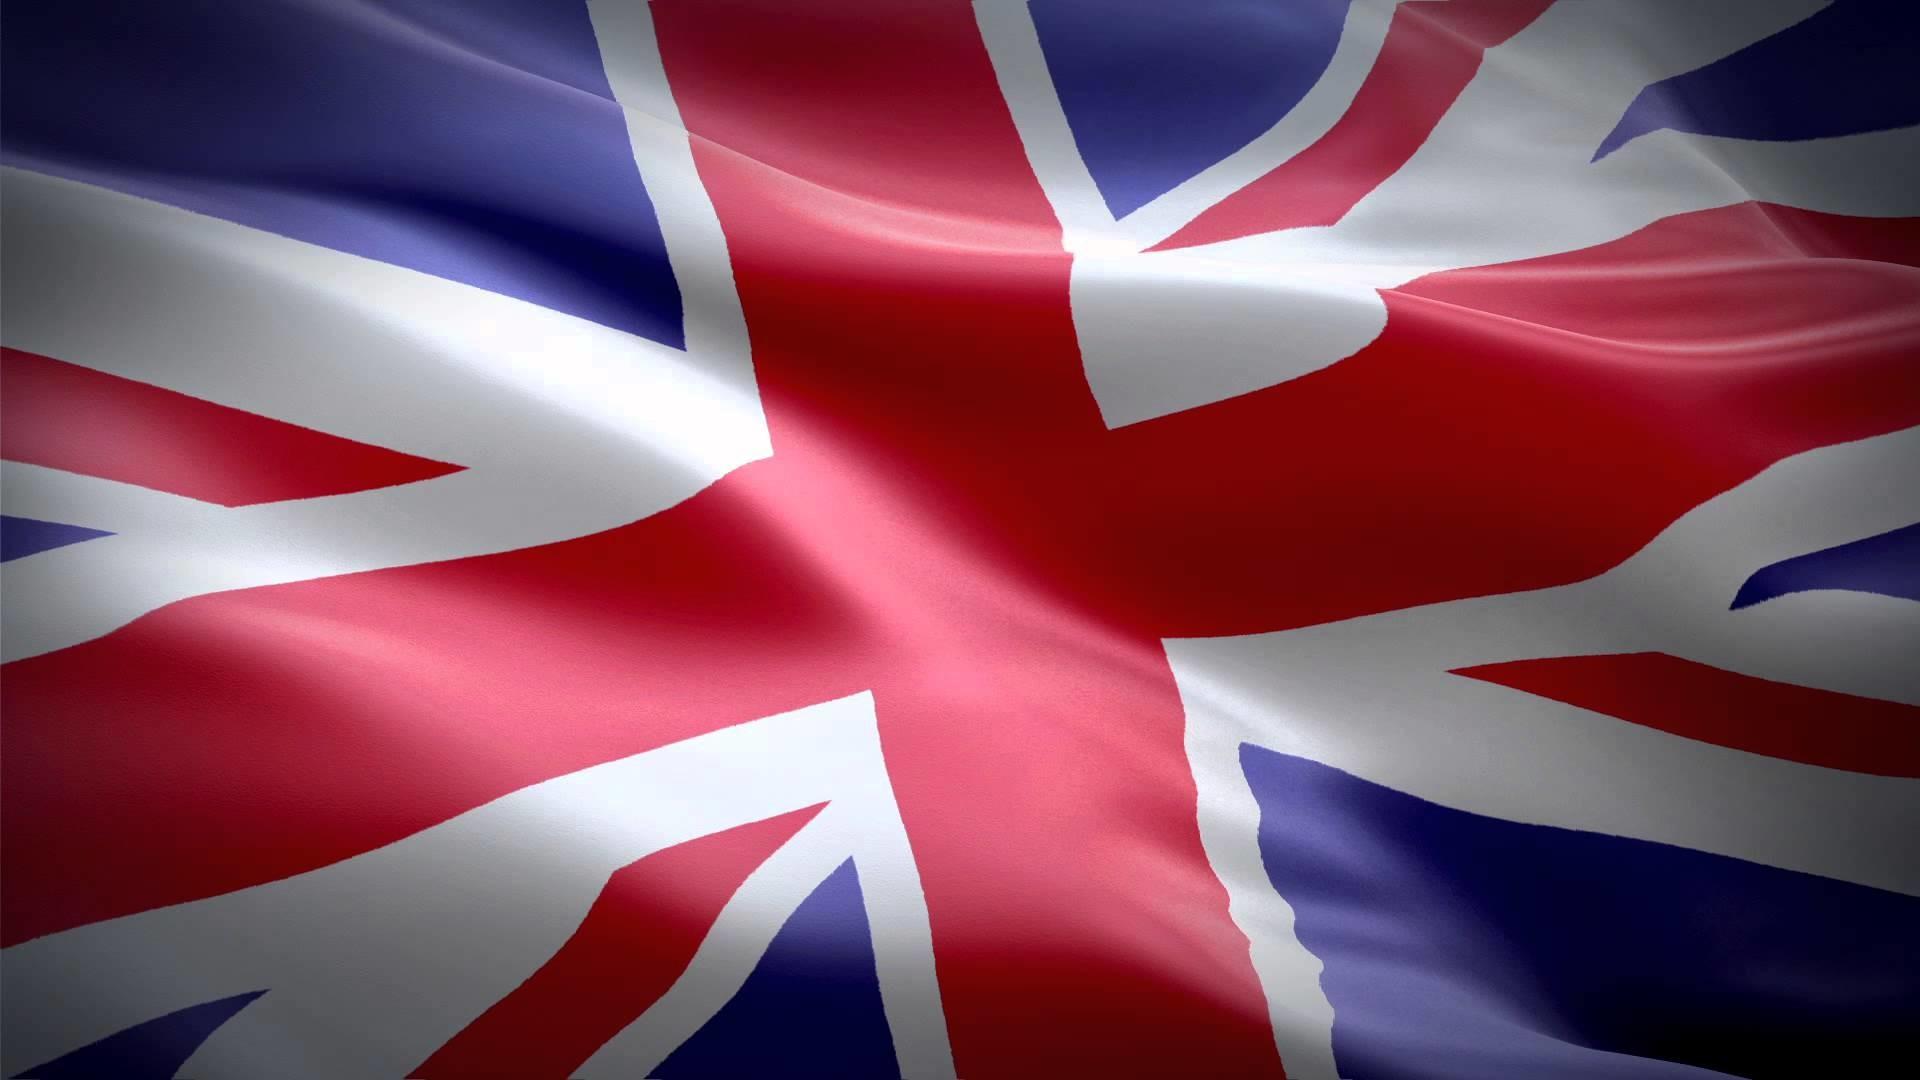 British Flag Background 51 Images